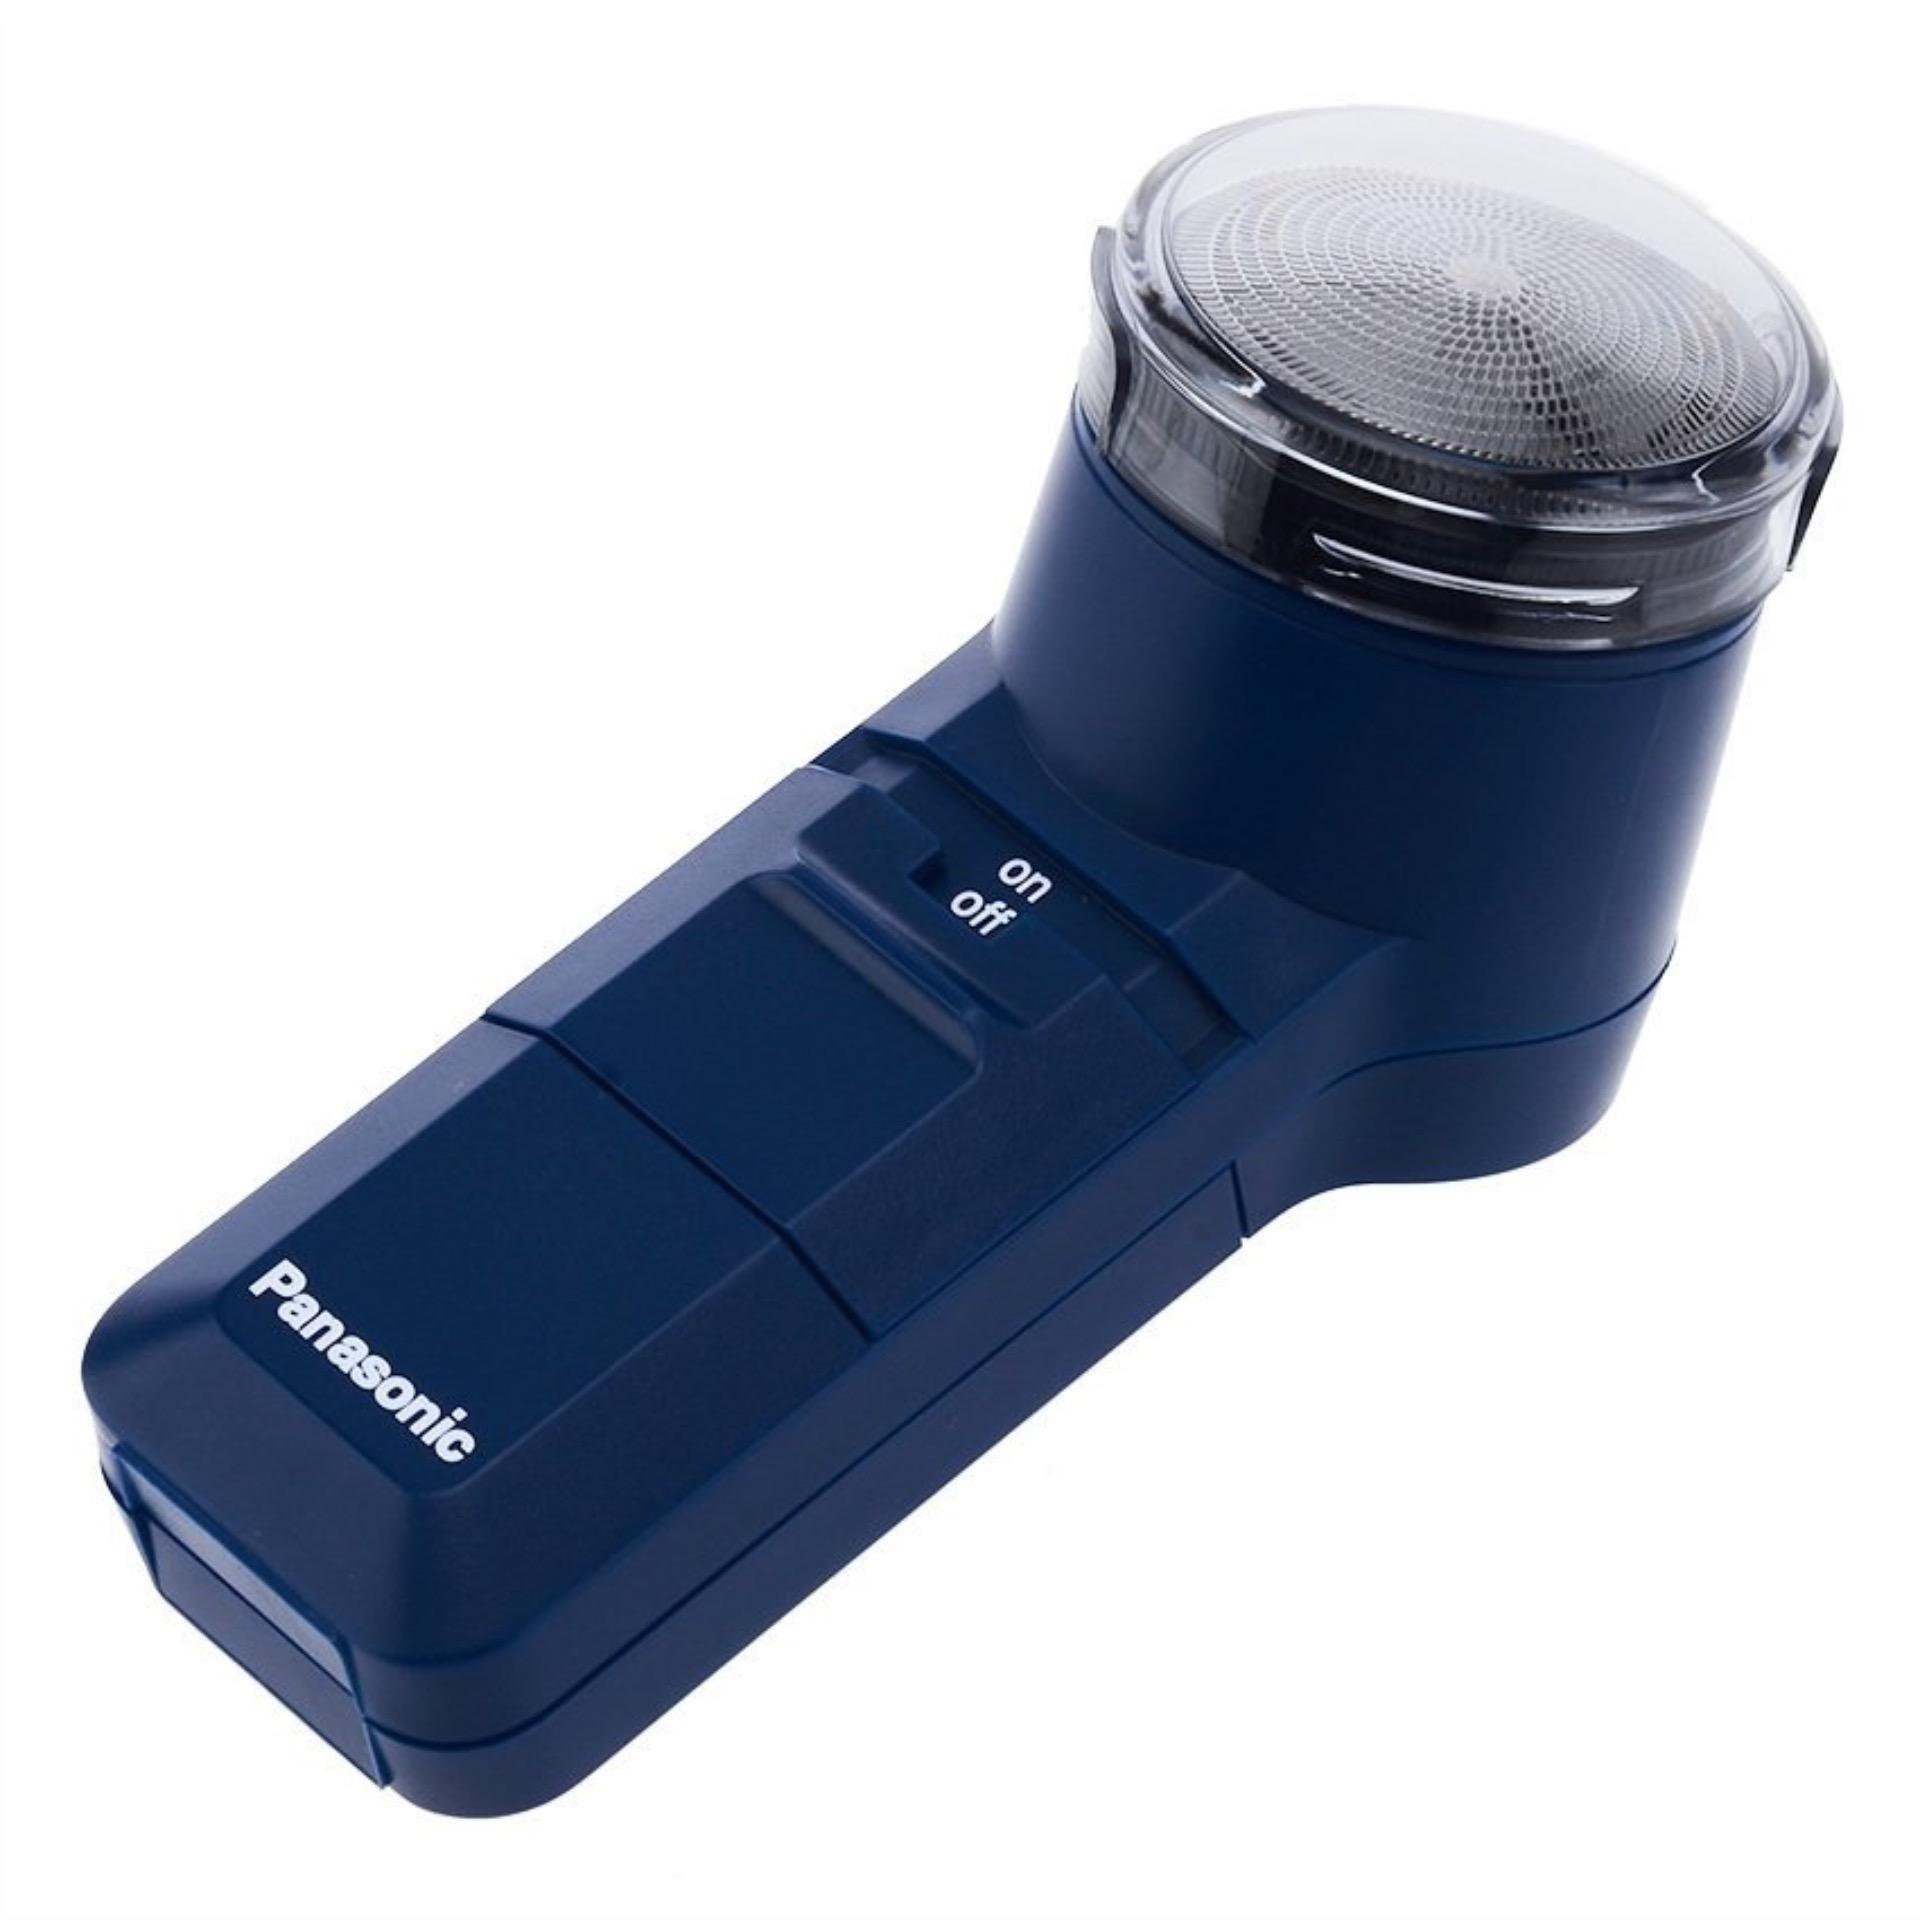 Gogo Grosir Panasonic Spinnet Battery Shaver ES 534 - Alat Cukur - Biru .